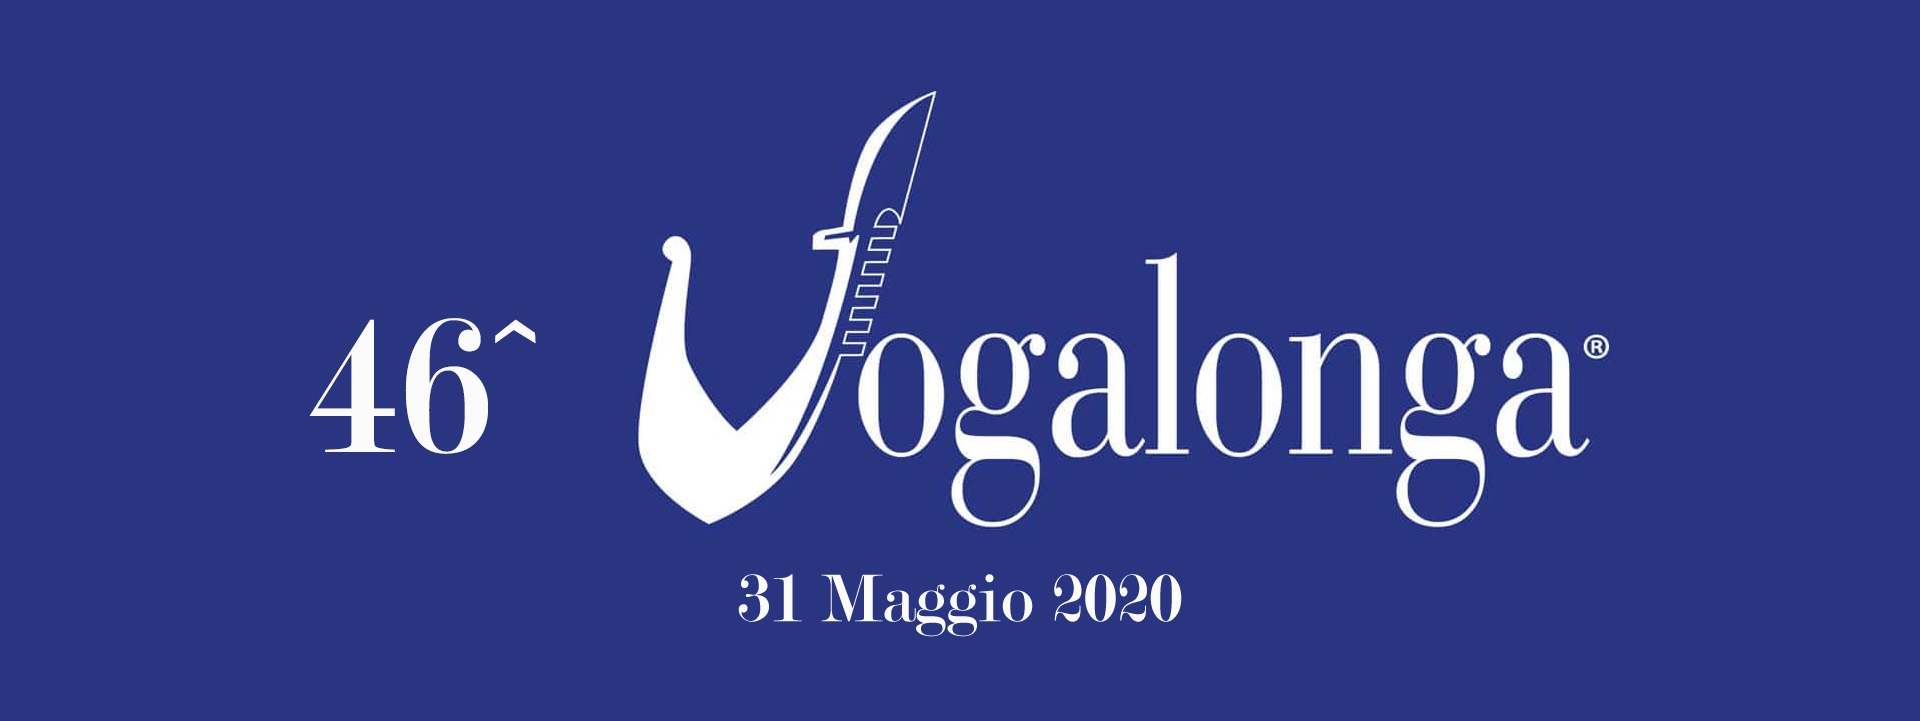 Vogalonga2020